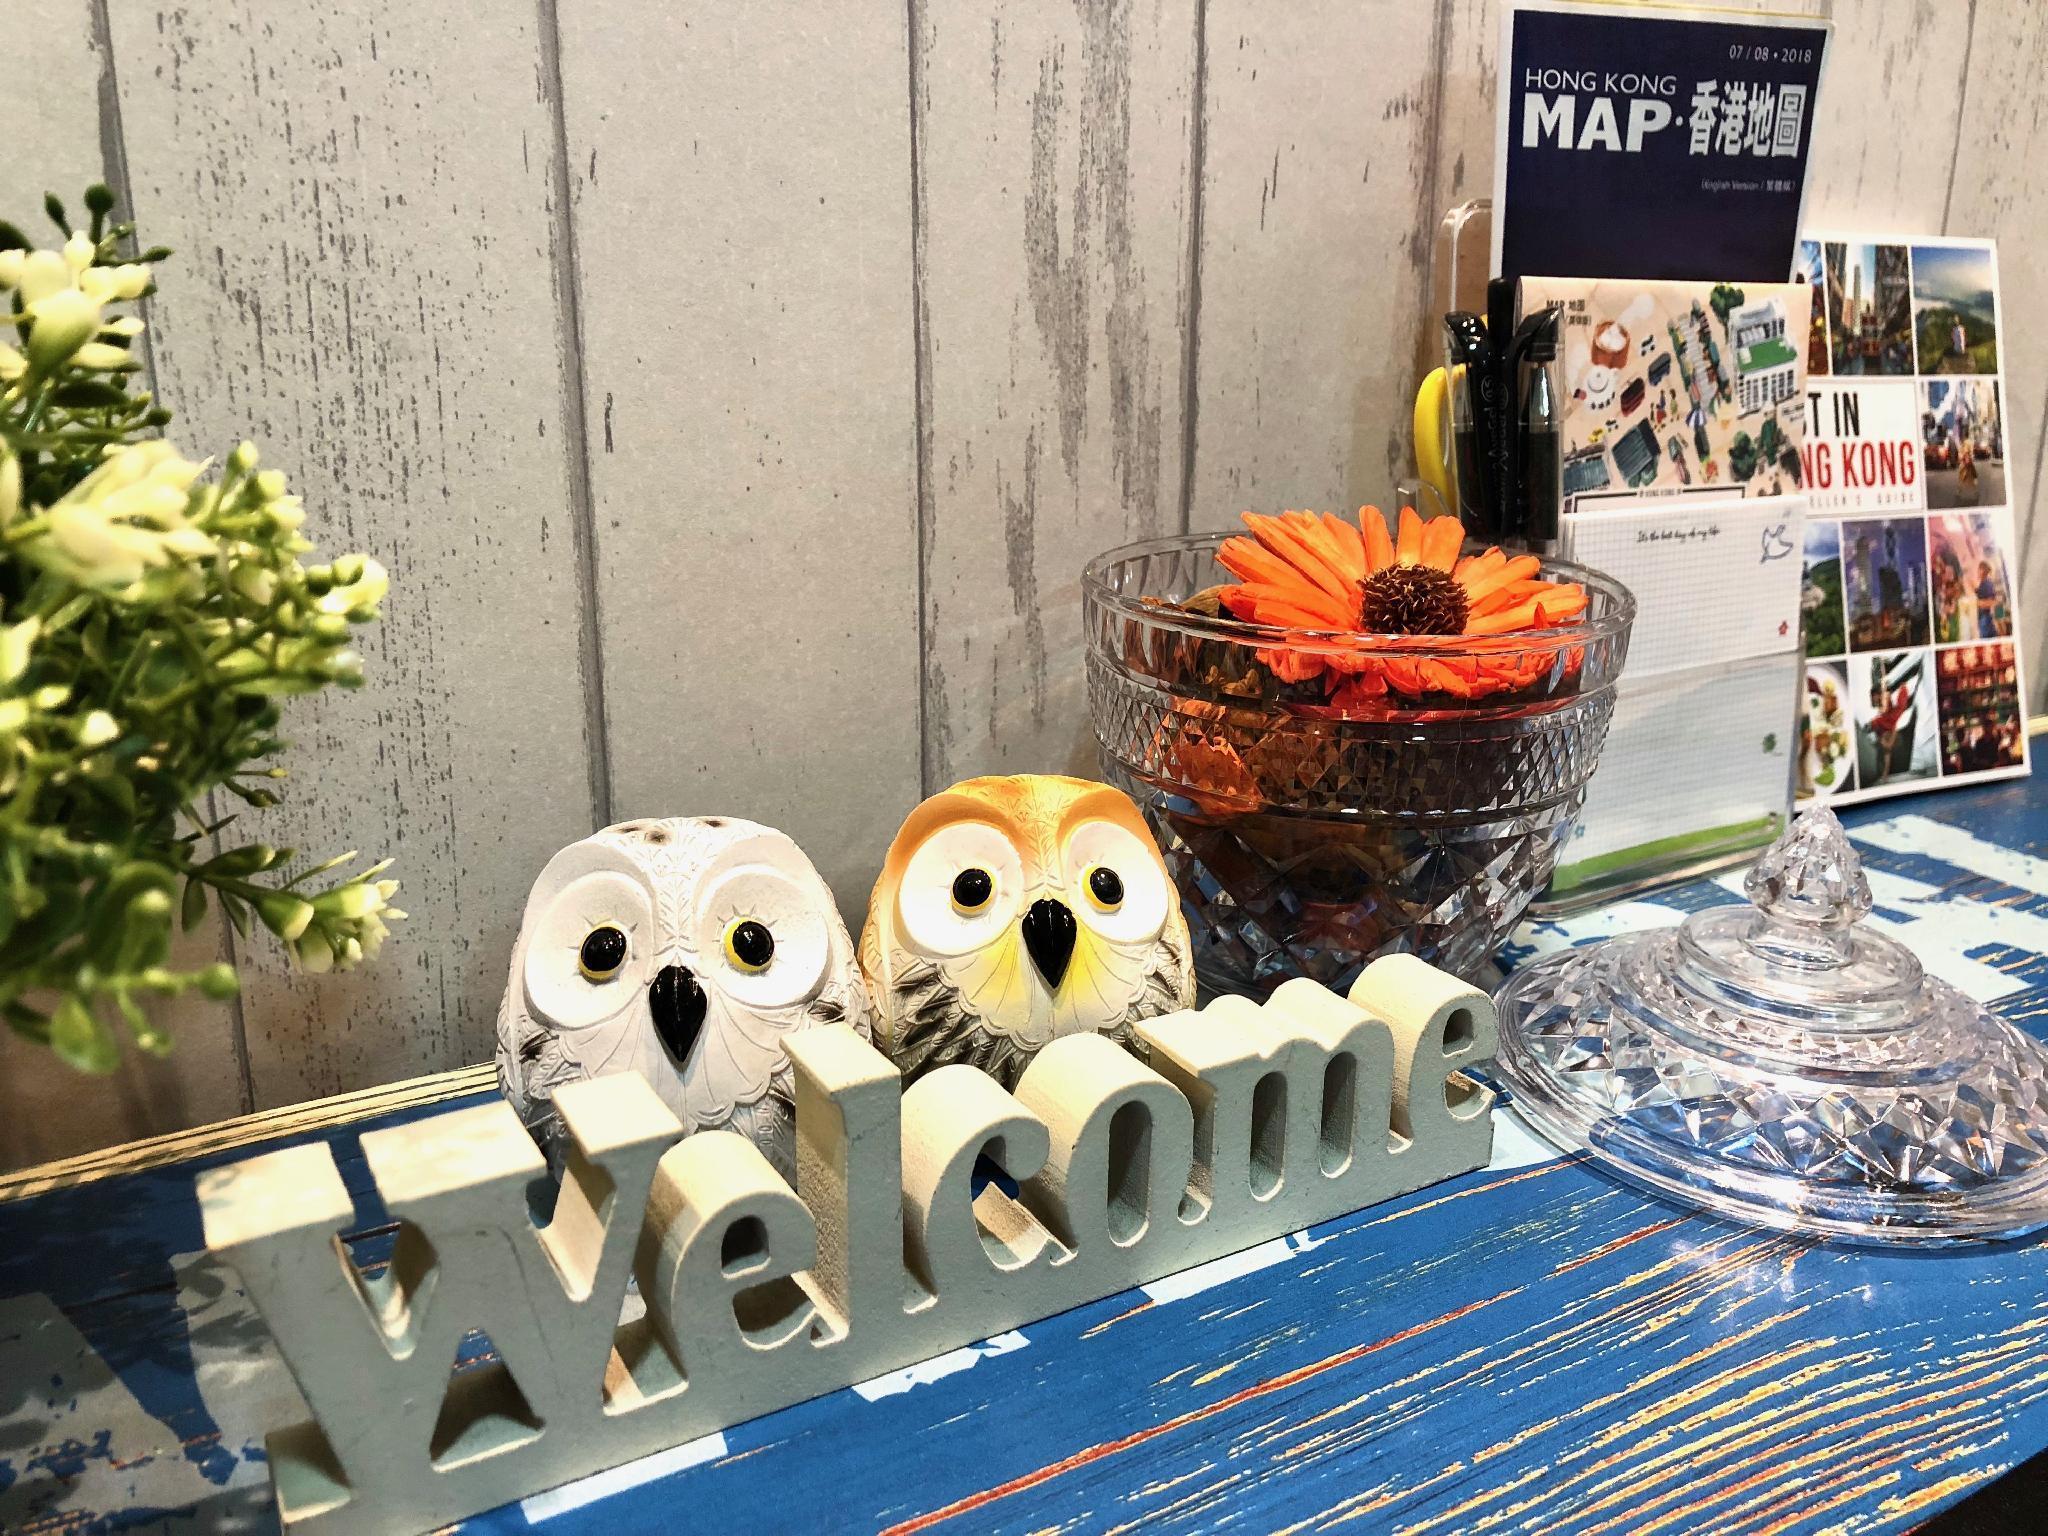 Owl Hostel